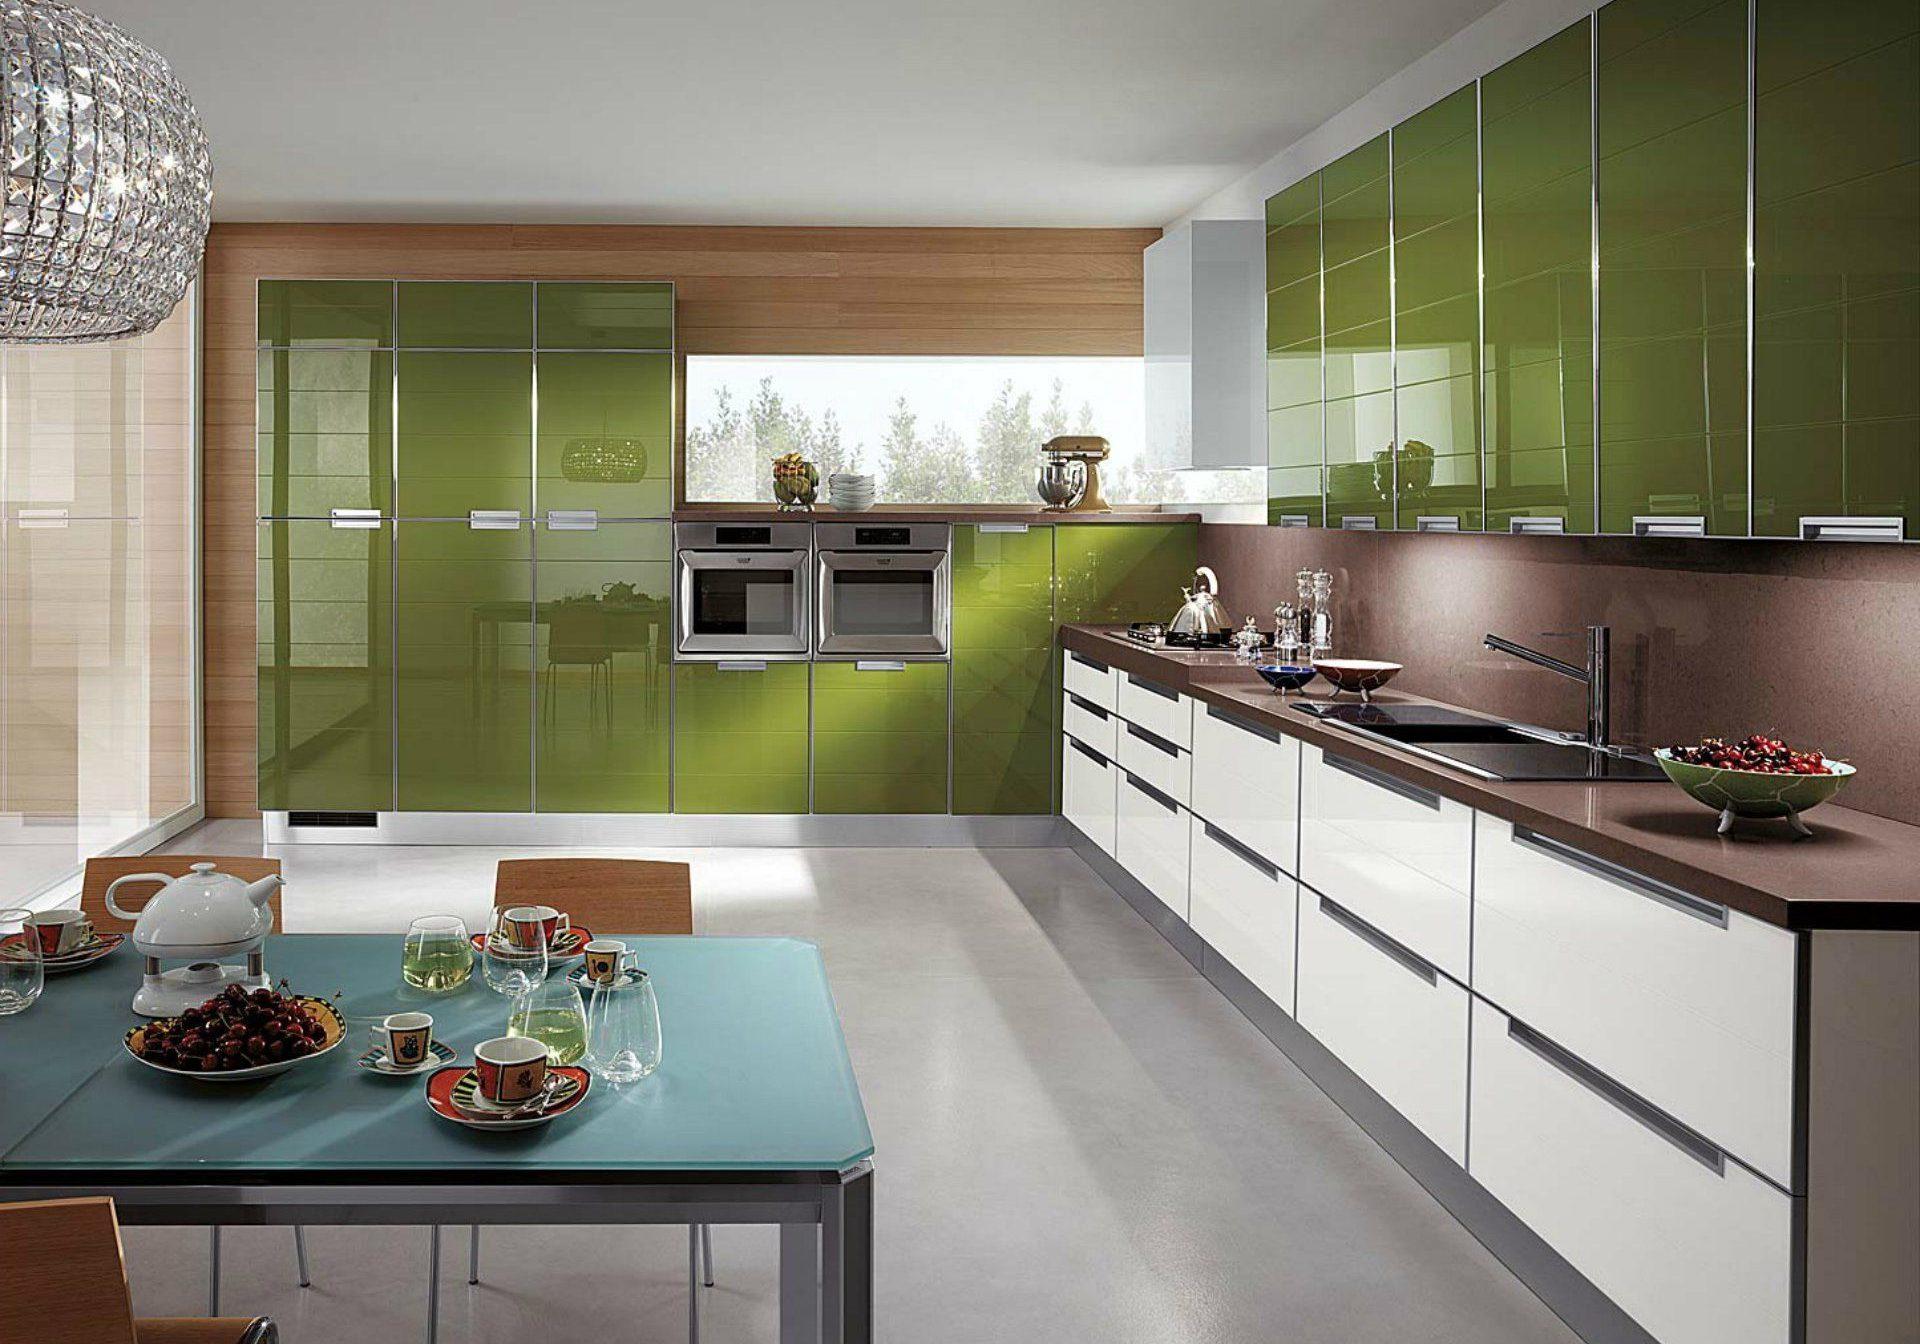 Кухня в коттедж оливково-белая